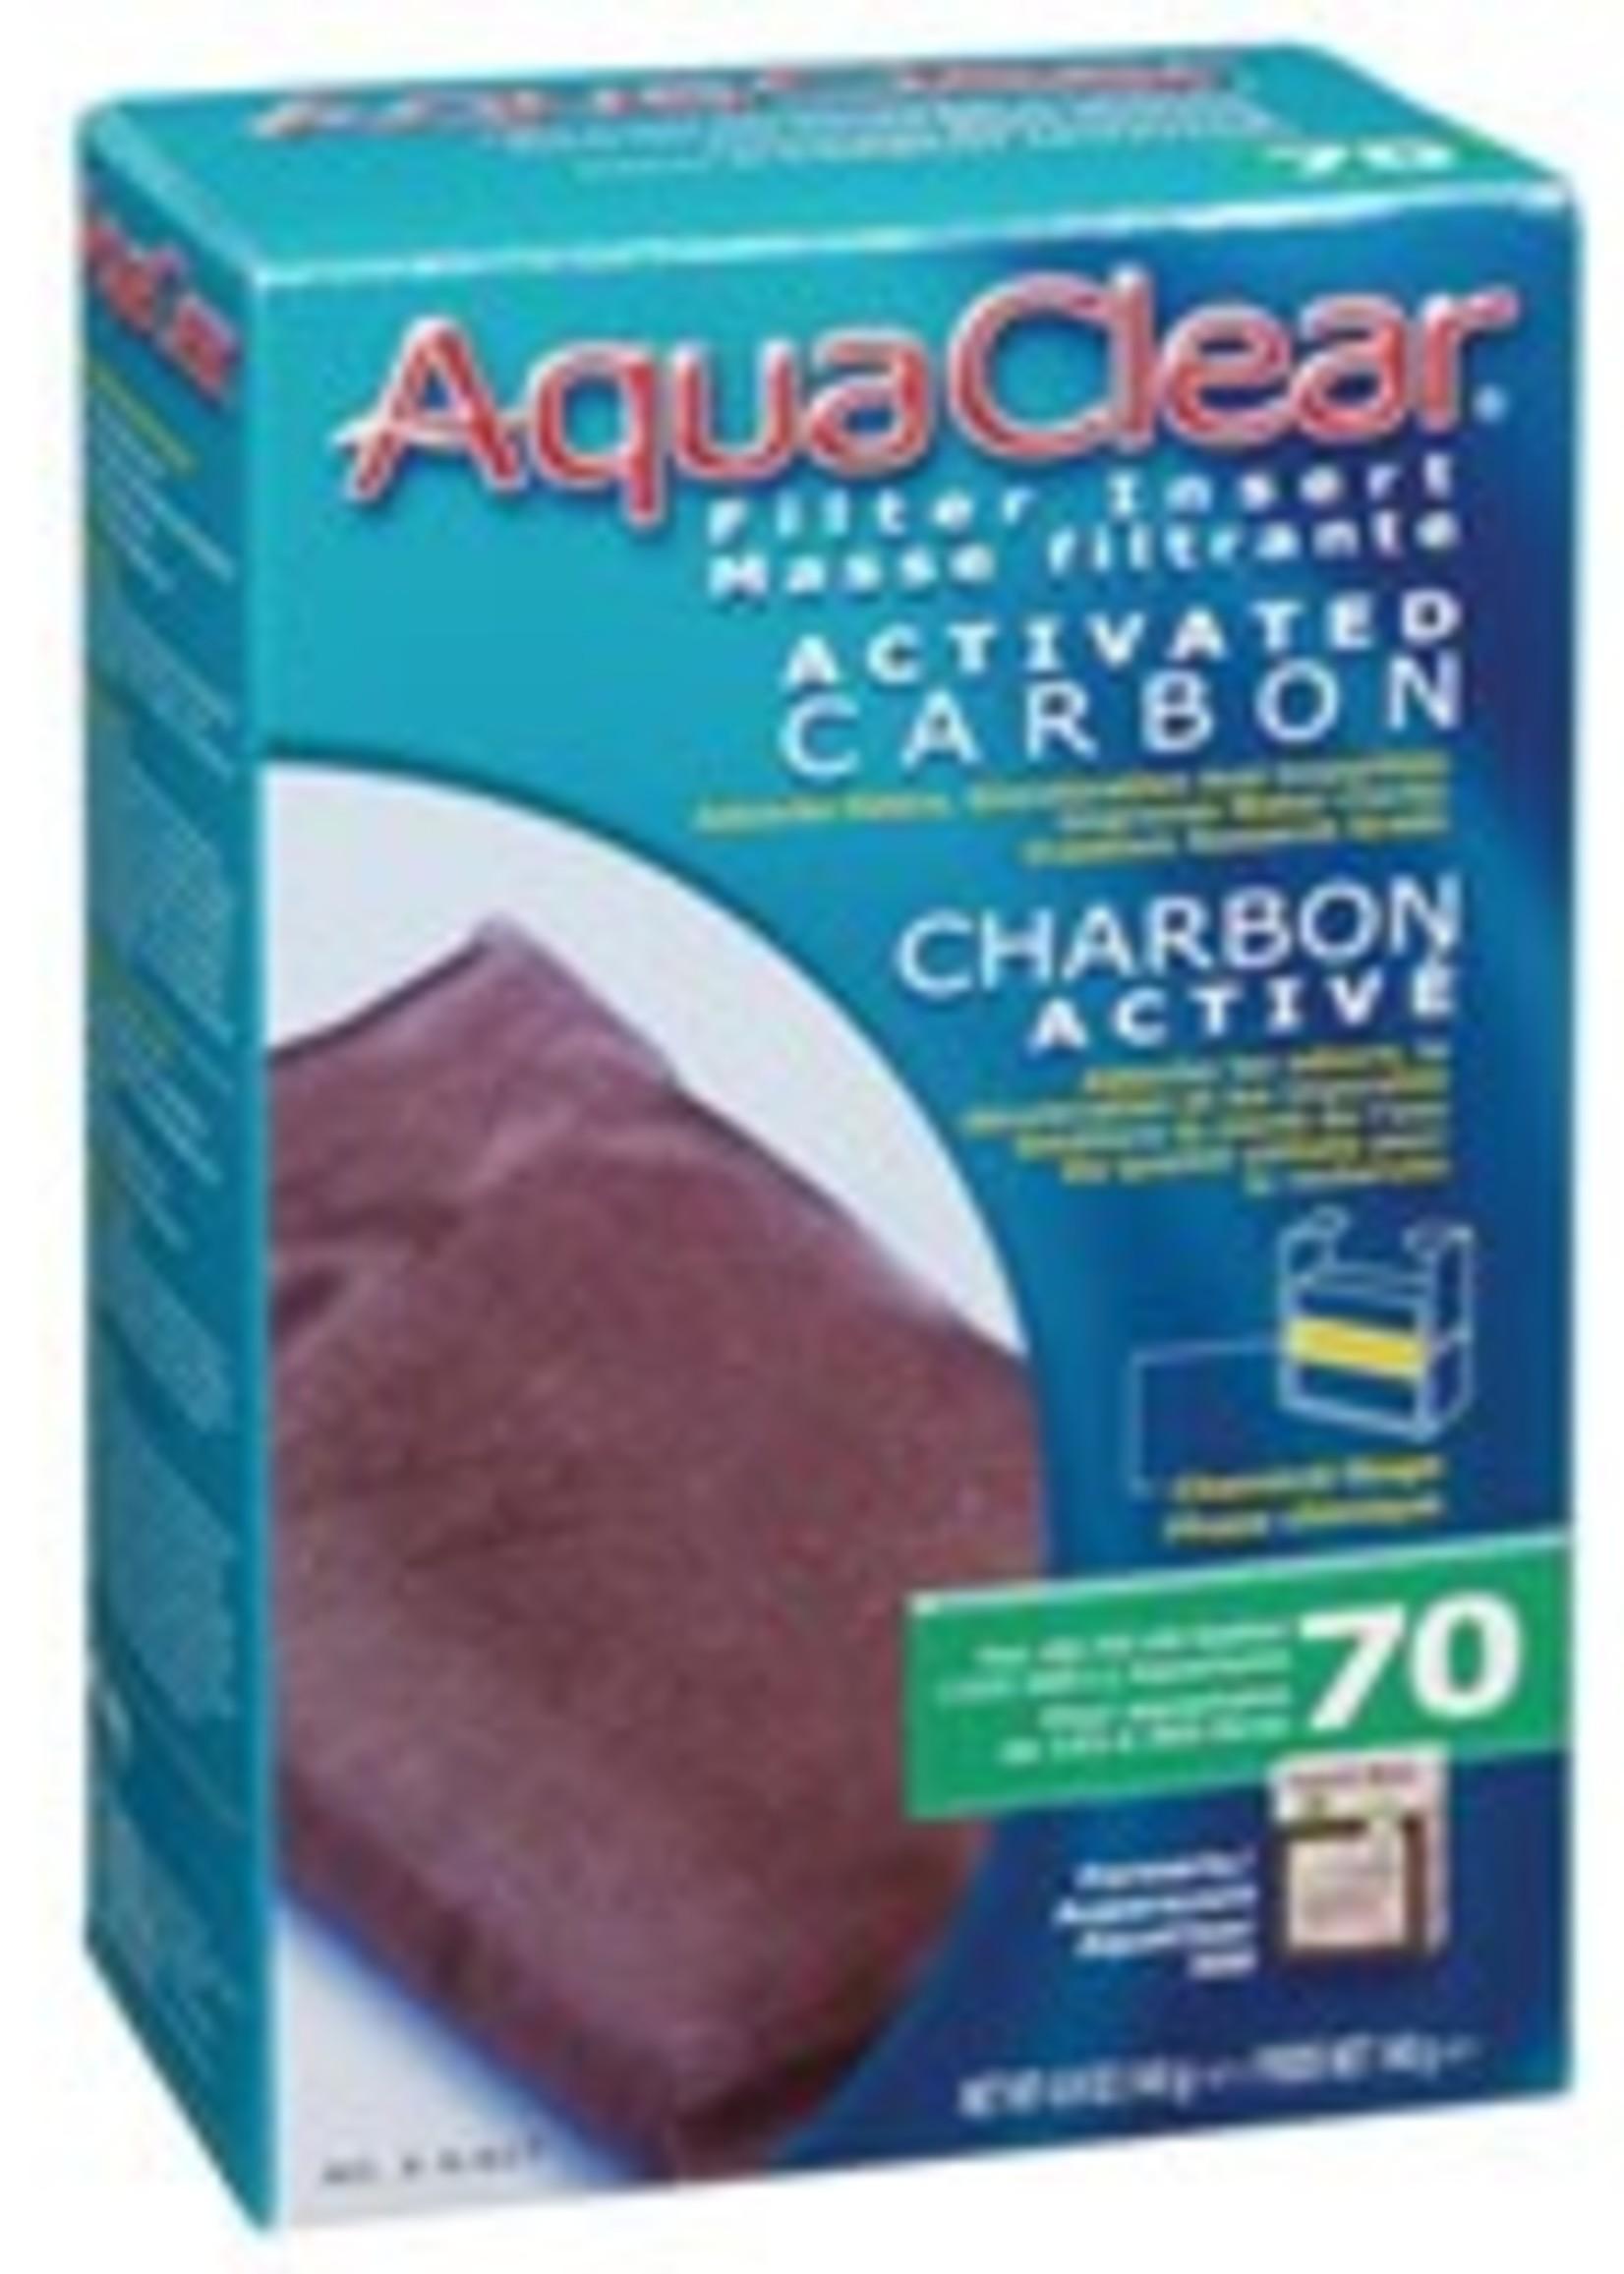 AquaClear 70 Activated Carbon, 140 g (4.9 oz)